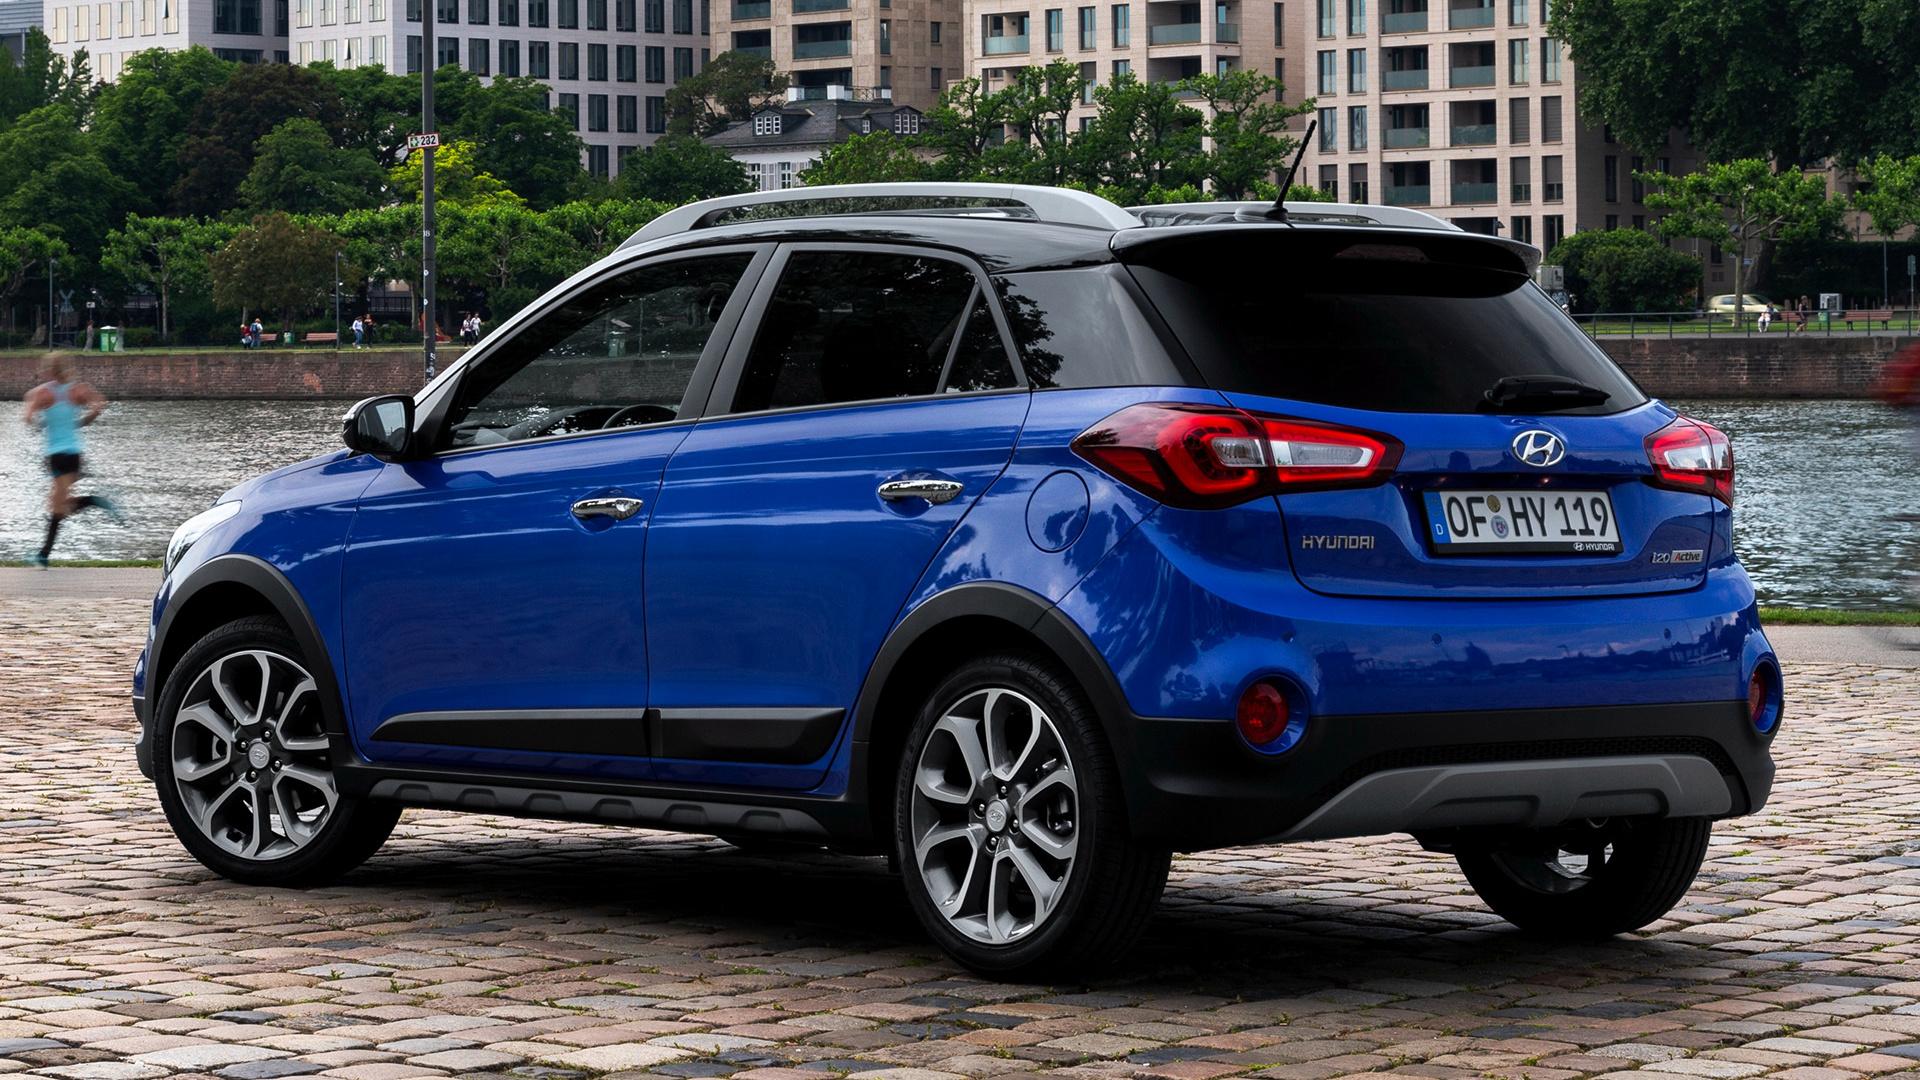 2018 Hyundai i20 Active   Wallpapers and HD Images Car Pixel 1920x1080